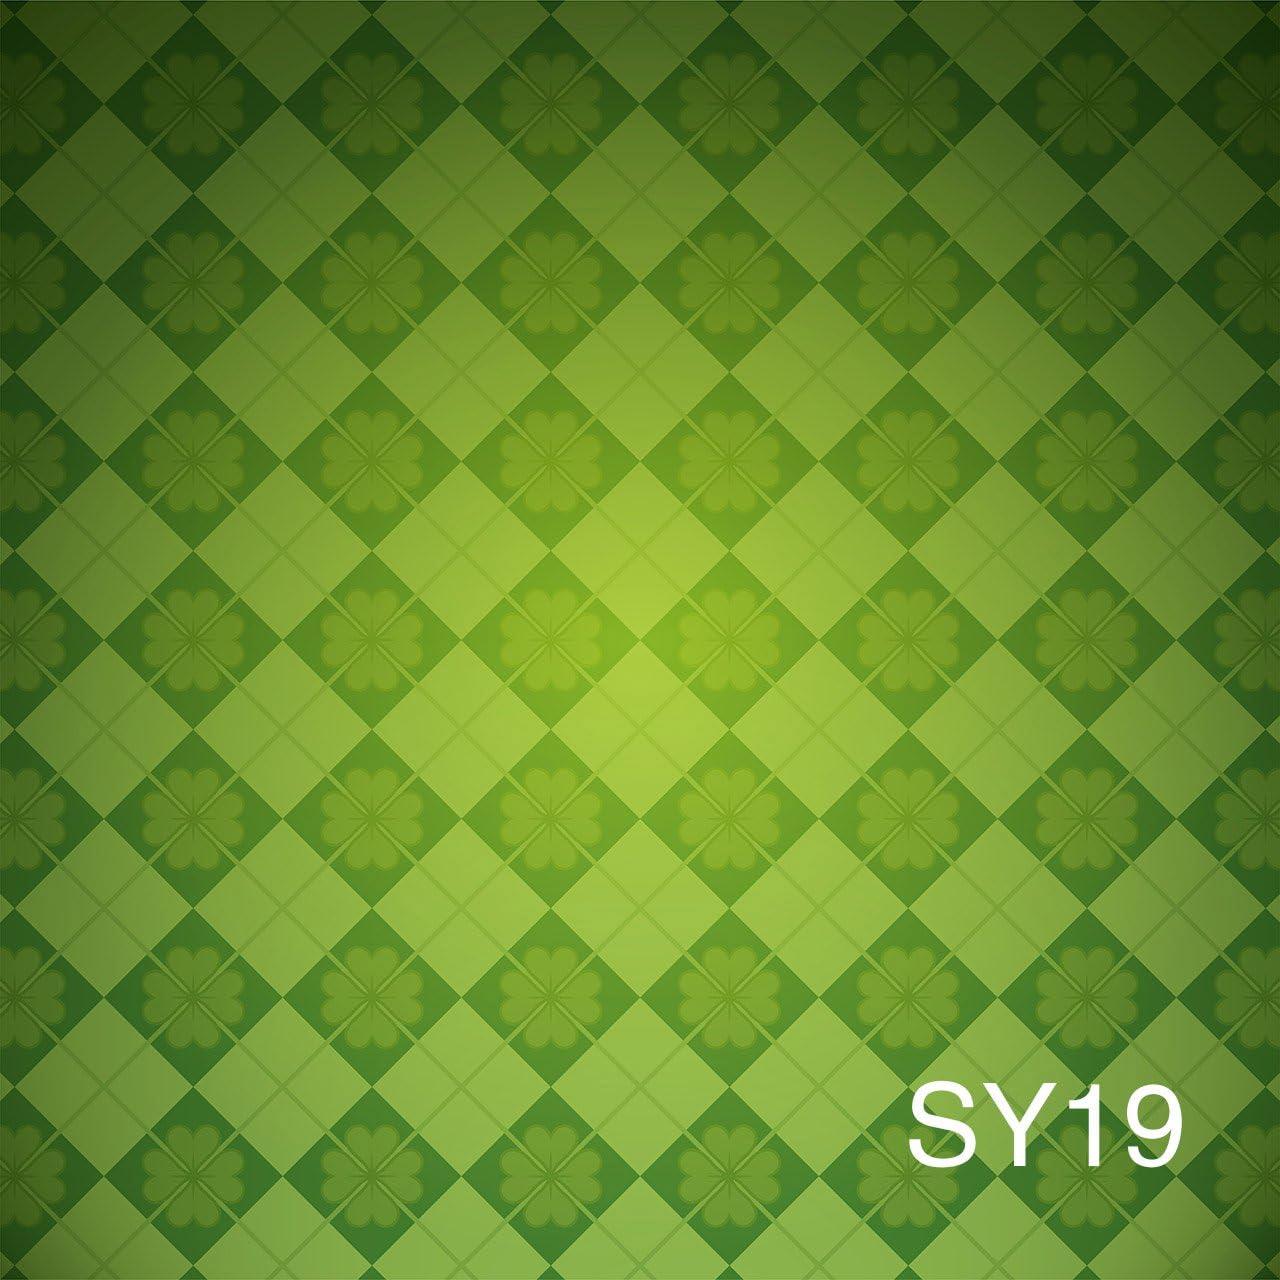 LB St.Patricks Day Backdrops for Photography 10x10ft Vinyl Green Shamrocks Background for Baby Kids Portraits Photo Backdrop Studio Props